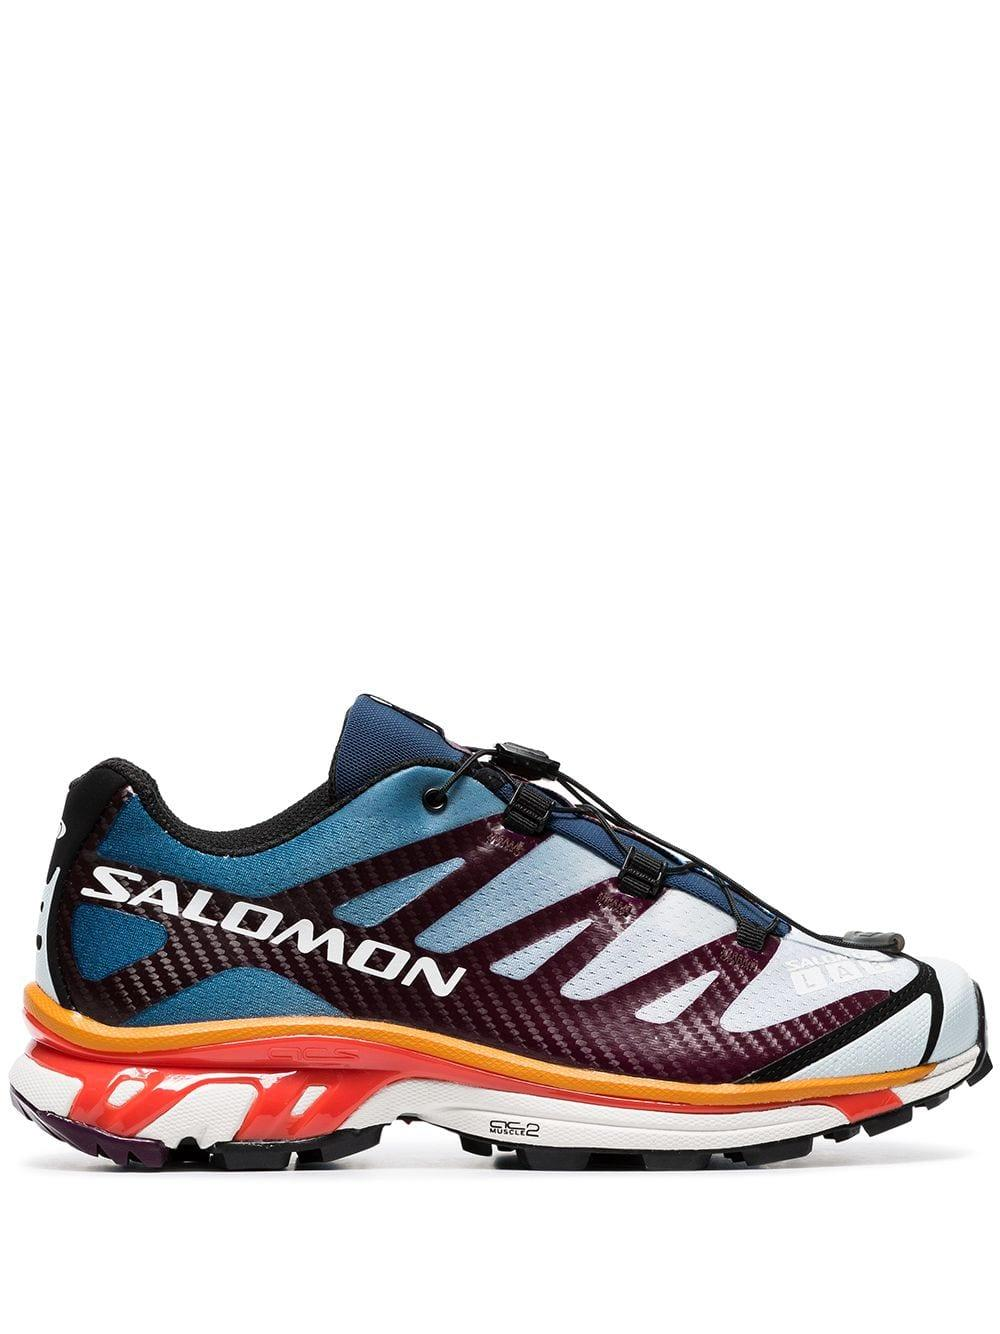 Salomon SLAB Synthetic Multicoloured Xt 4 Adv Sneakers for